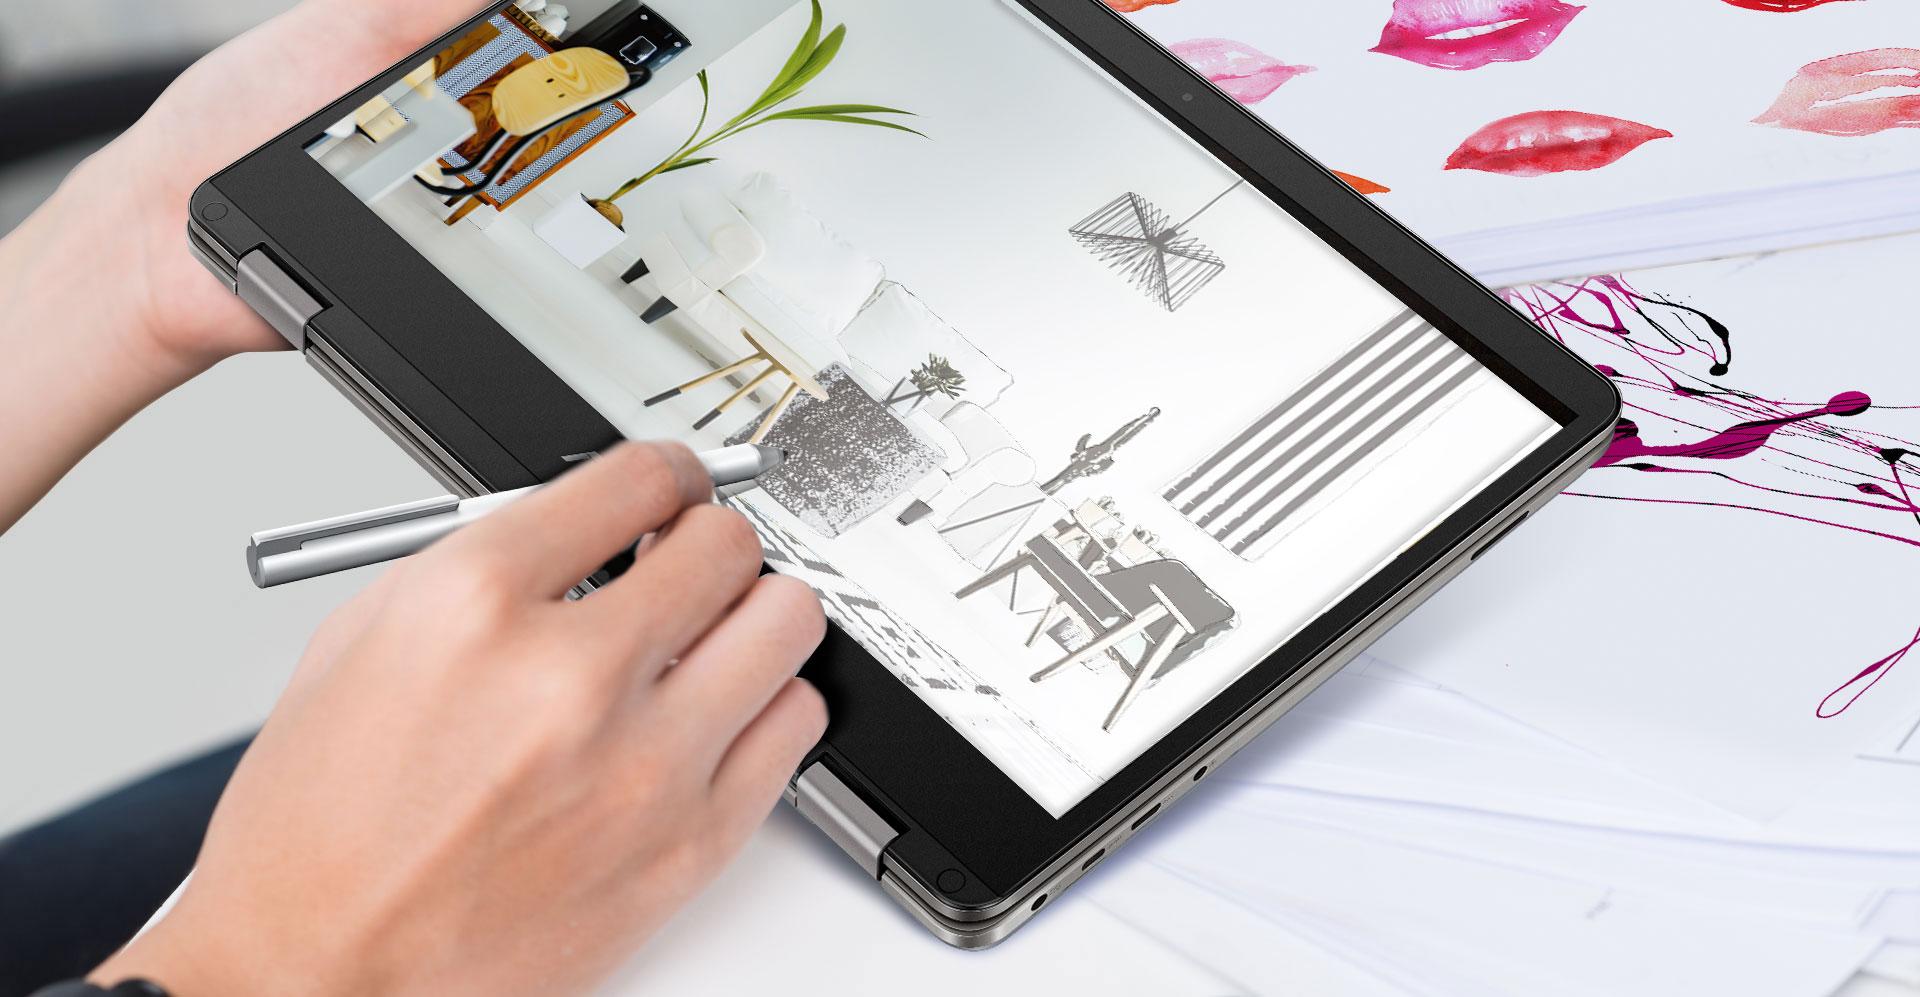 https://dlcdnimgs.asus.com/websites/global/products/EDmoiogCt4PSLvK2/images/desktop/img-write.jpg